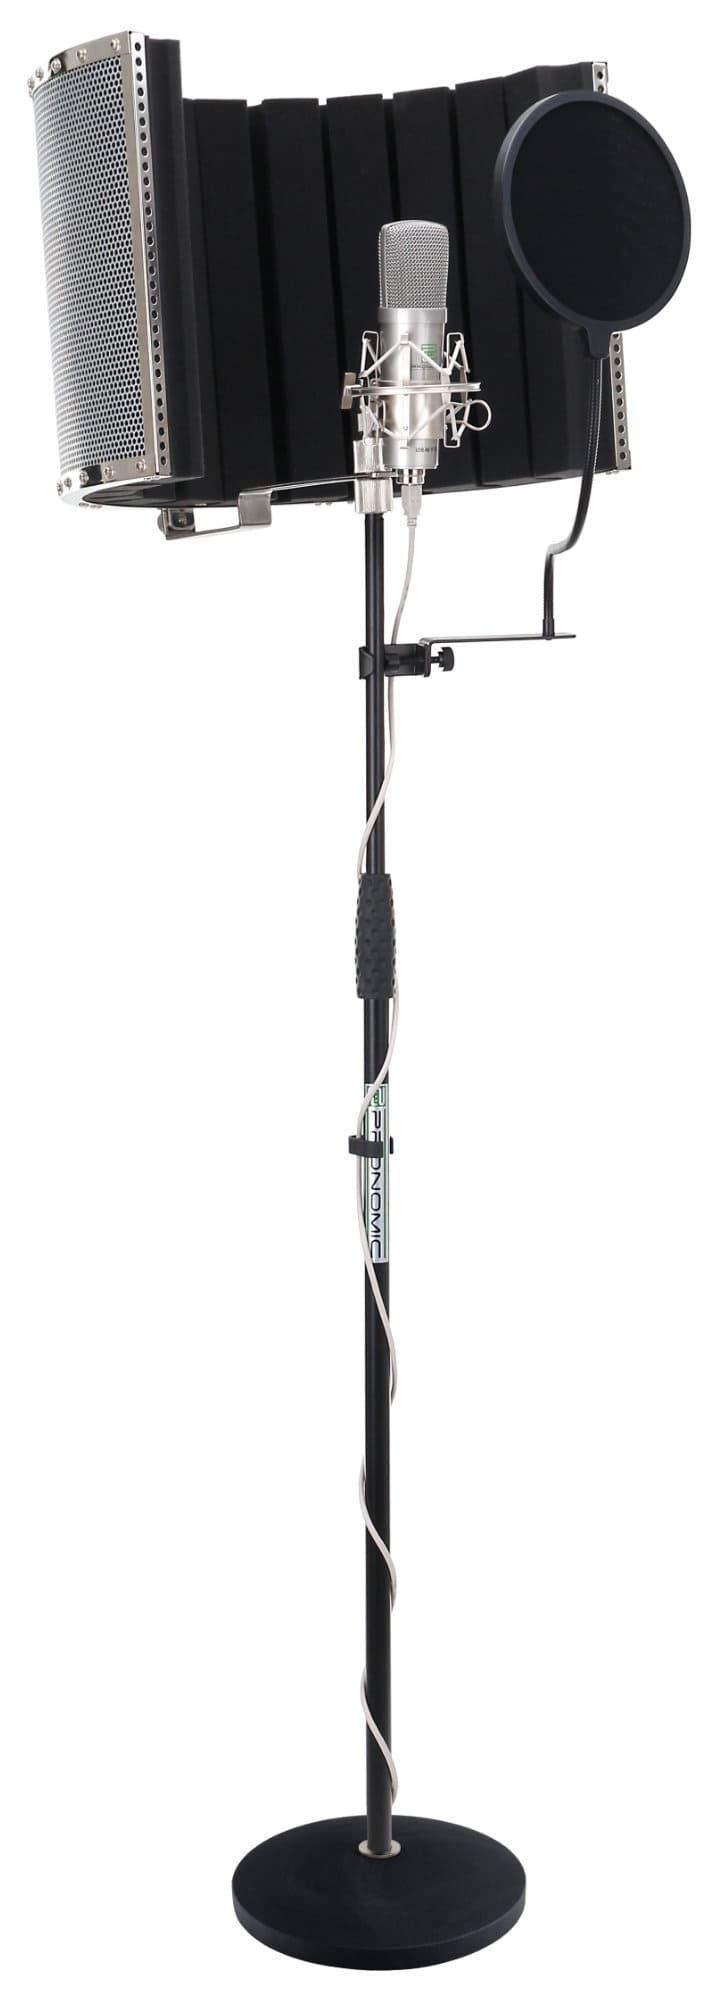 Mikrofone - Pronomic USB M 910 Kondensator Mikrofon Komplettset inkl. Stativ, Popschutz Micscreen - Onlineshop Musikhaus Kirstein